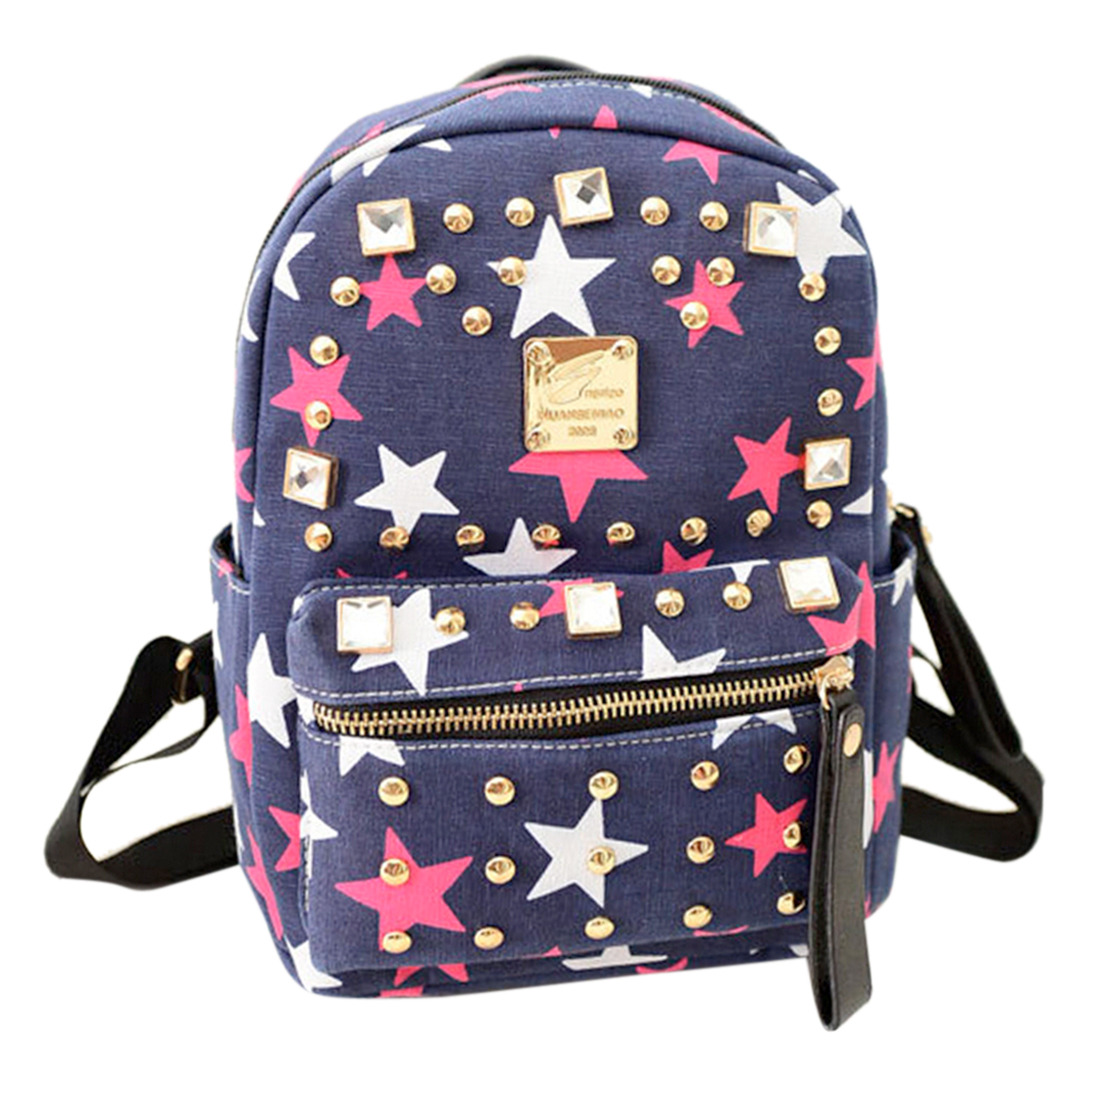 Hot Women Demin Rhinestone Satchel Backpack Girl Back To School Bookbag Handbag